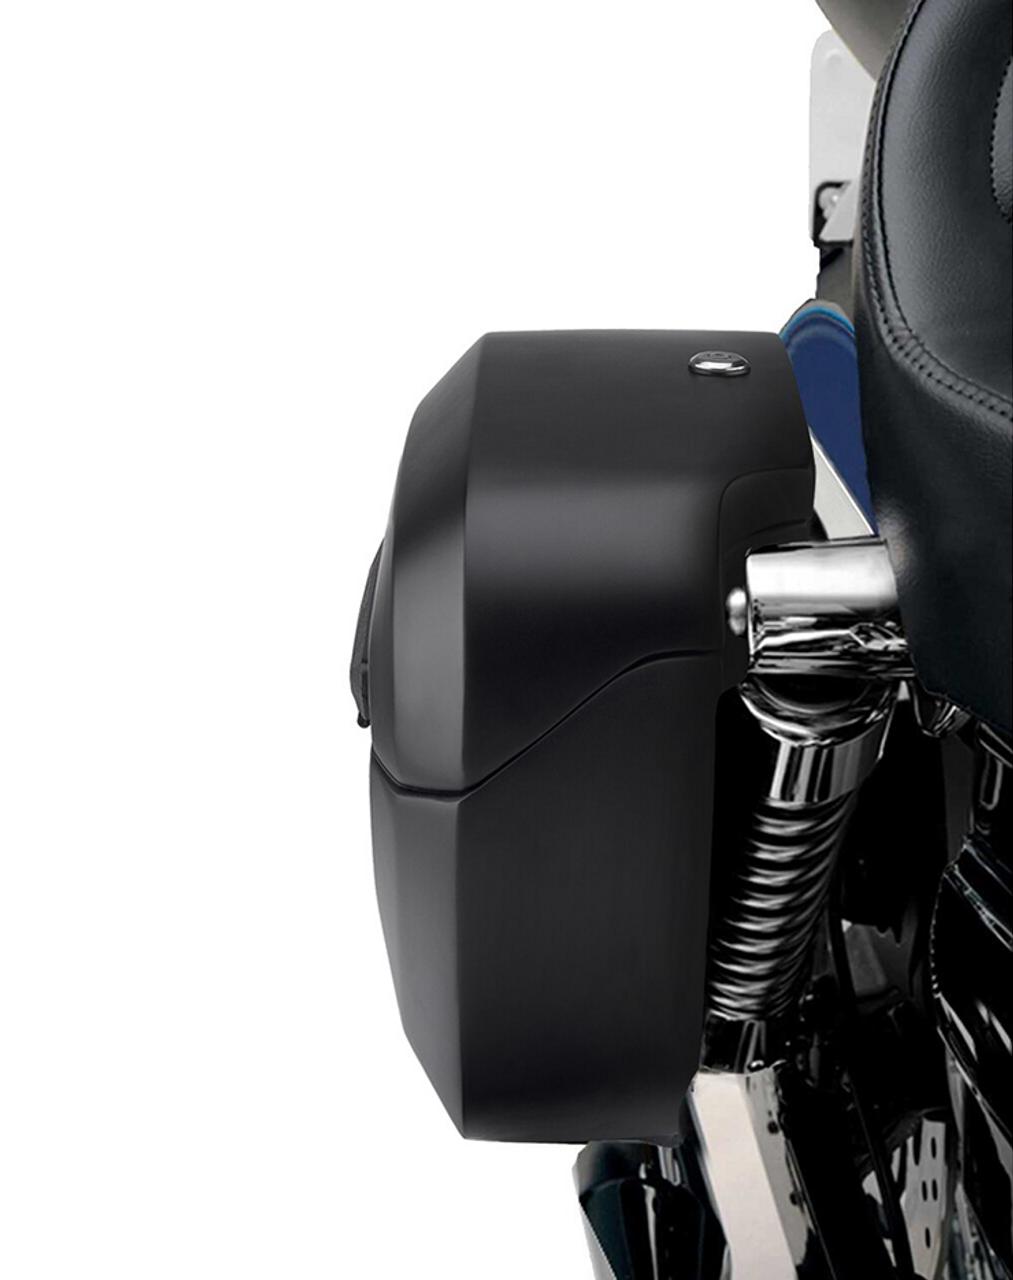 Viking Lamellar Shock Cutout Large Matte Motorcycle Hard Saddlebags For Harley Dyna Switchback Shock Cutout View